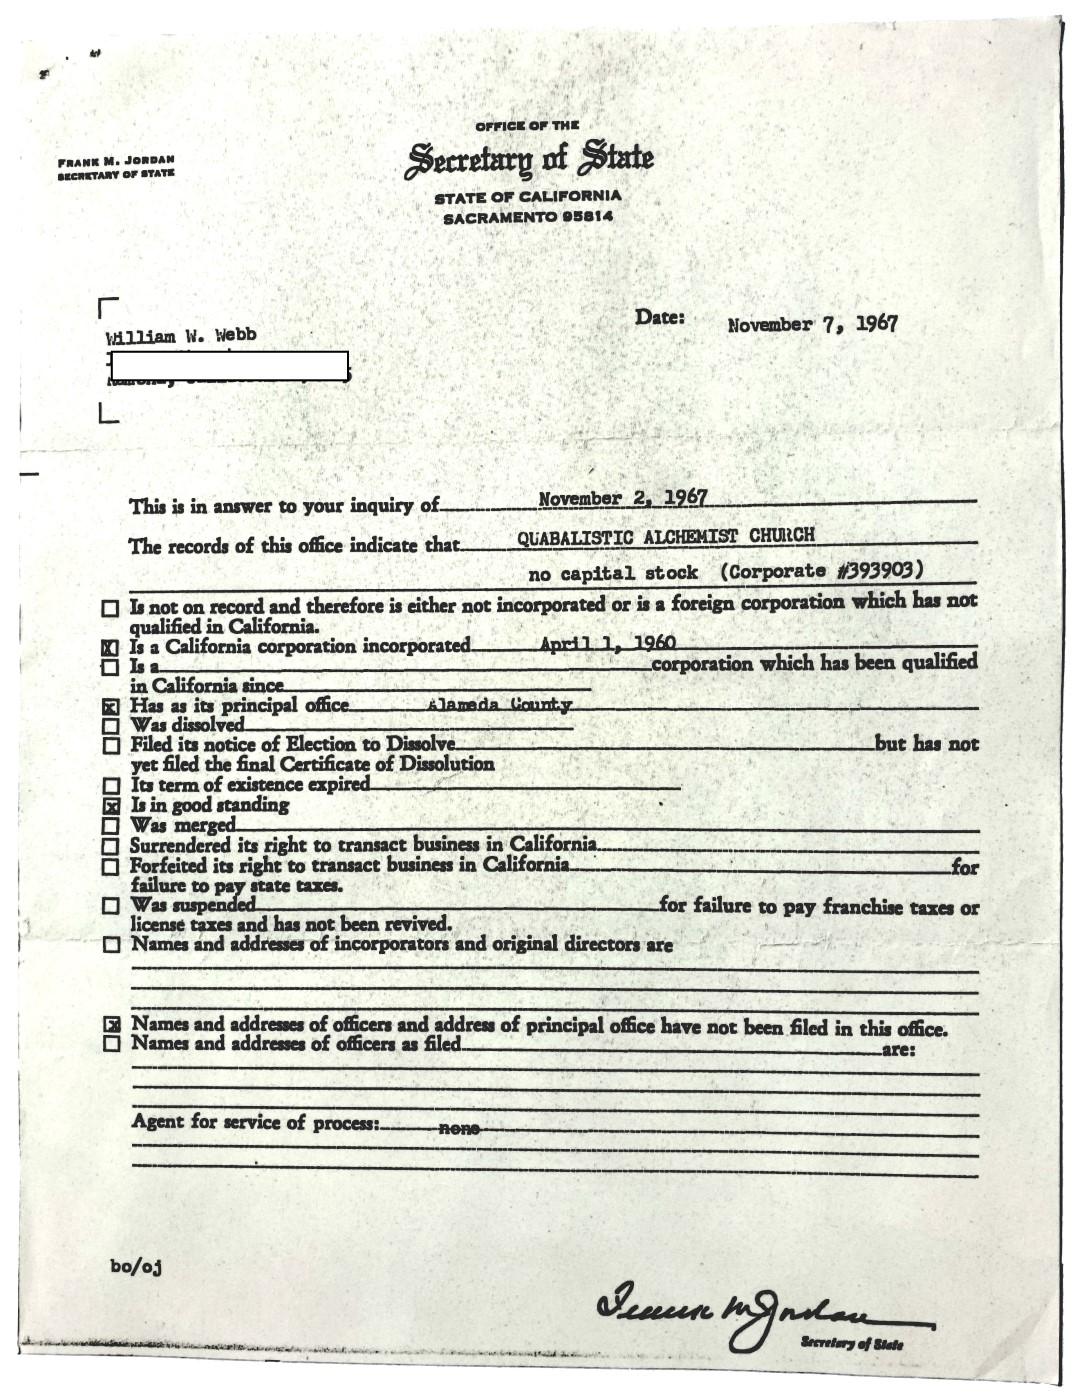 Quabalistic Alchemist Church William Wallace Webb registered